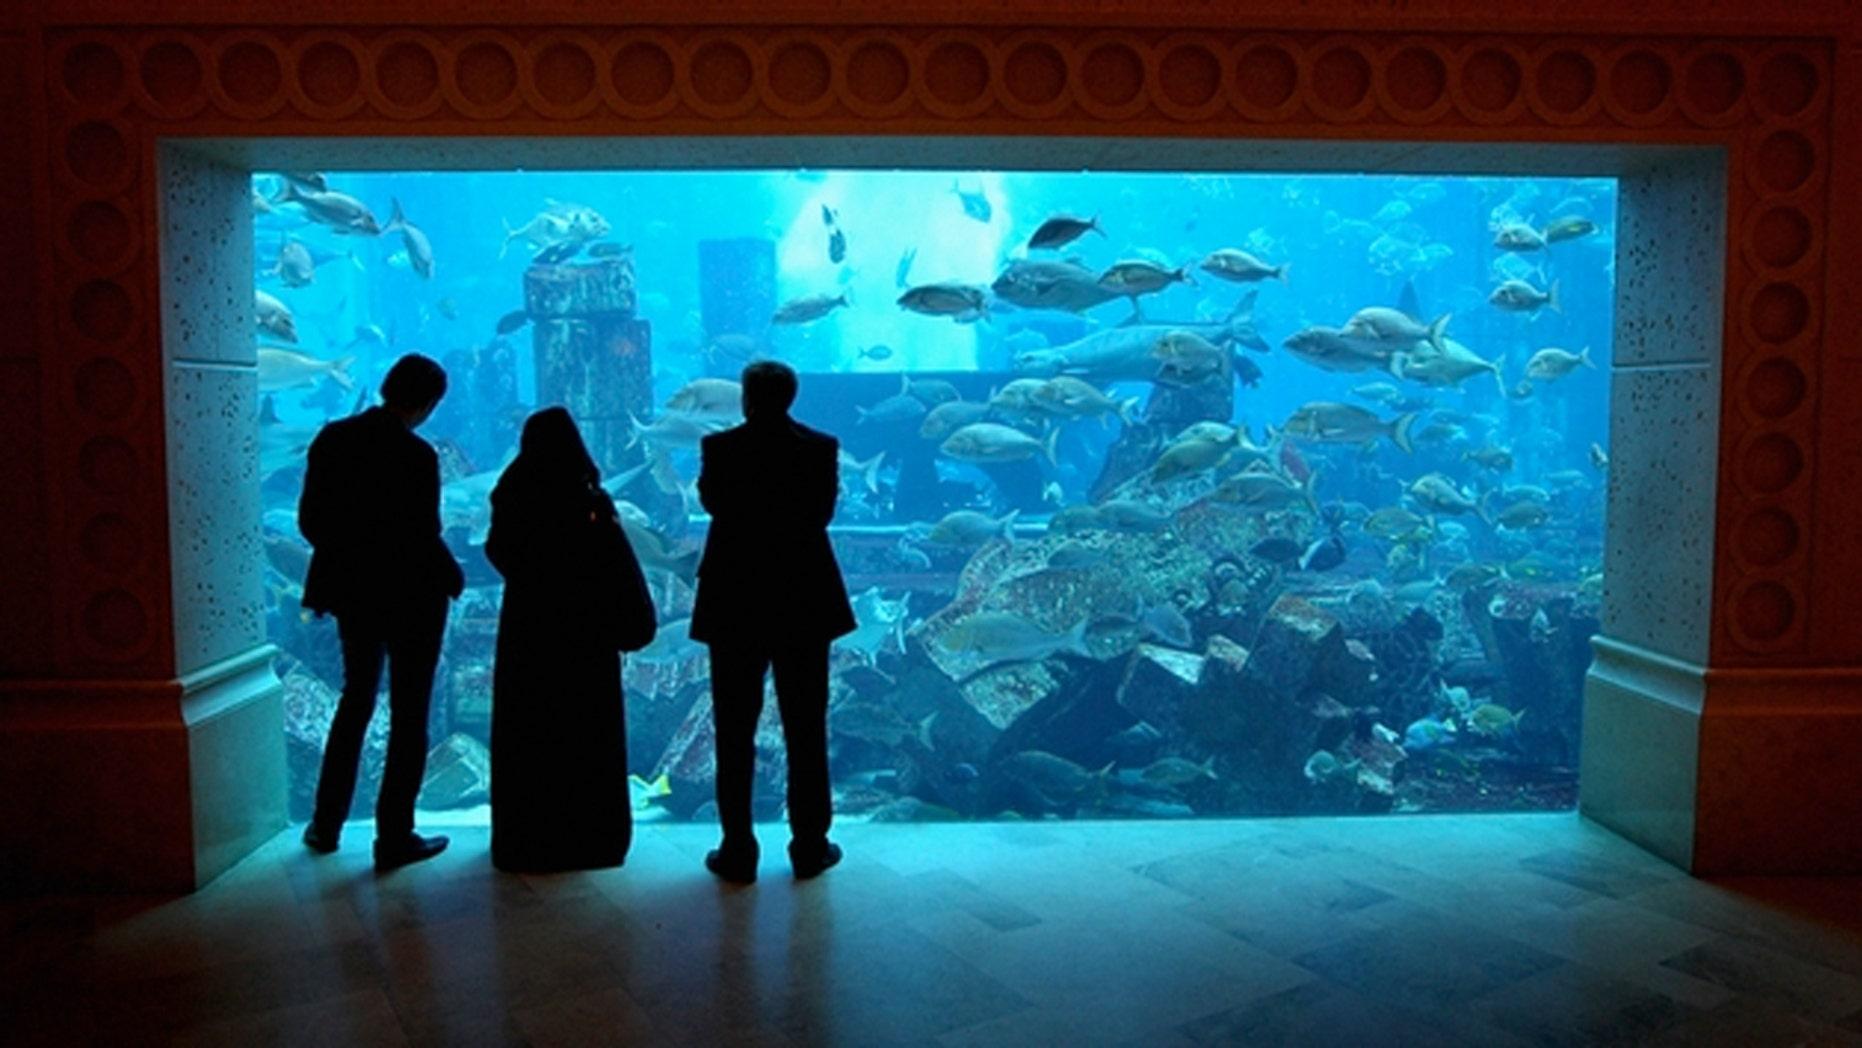 The giant tank at Atlantis the Palm Hotel in Dubai, United Arab Emirates. (Chris Jackson/Getty Images)